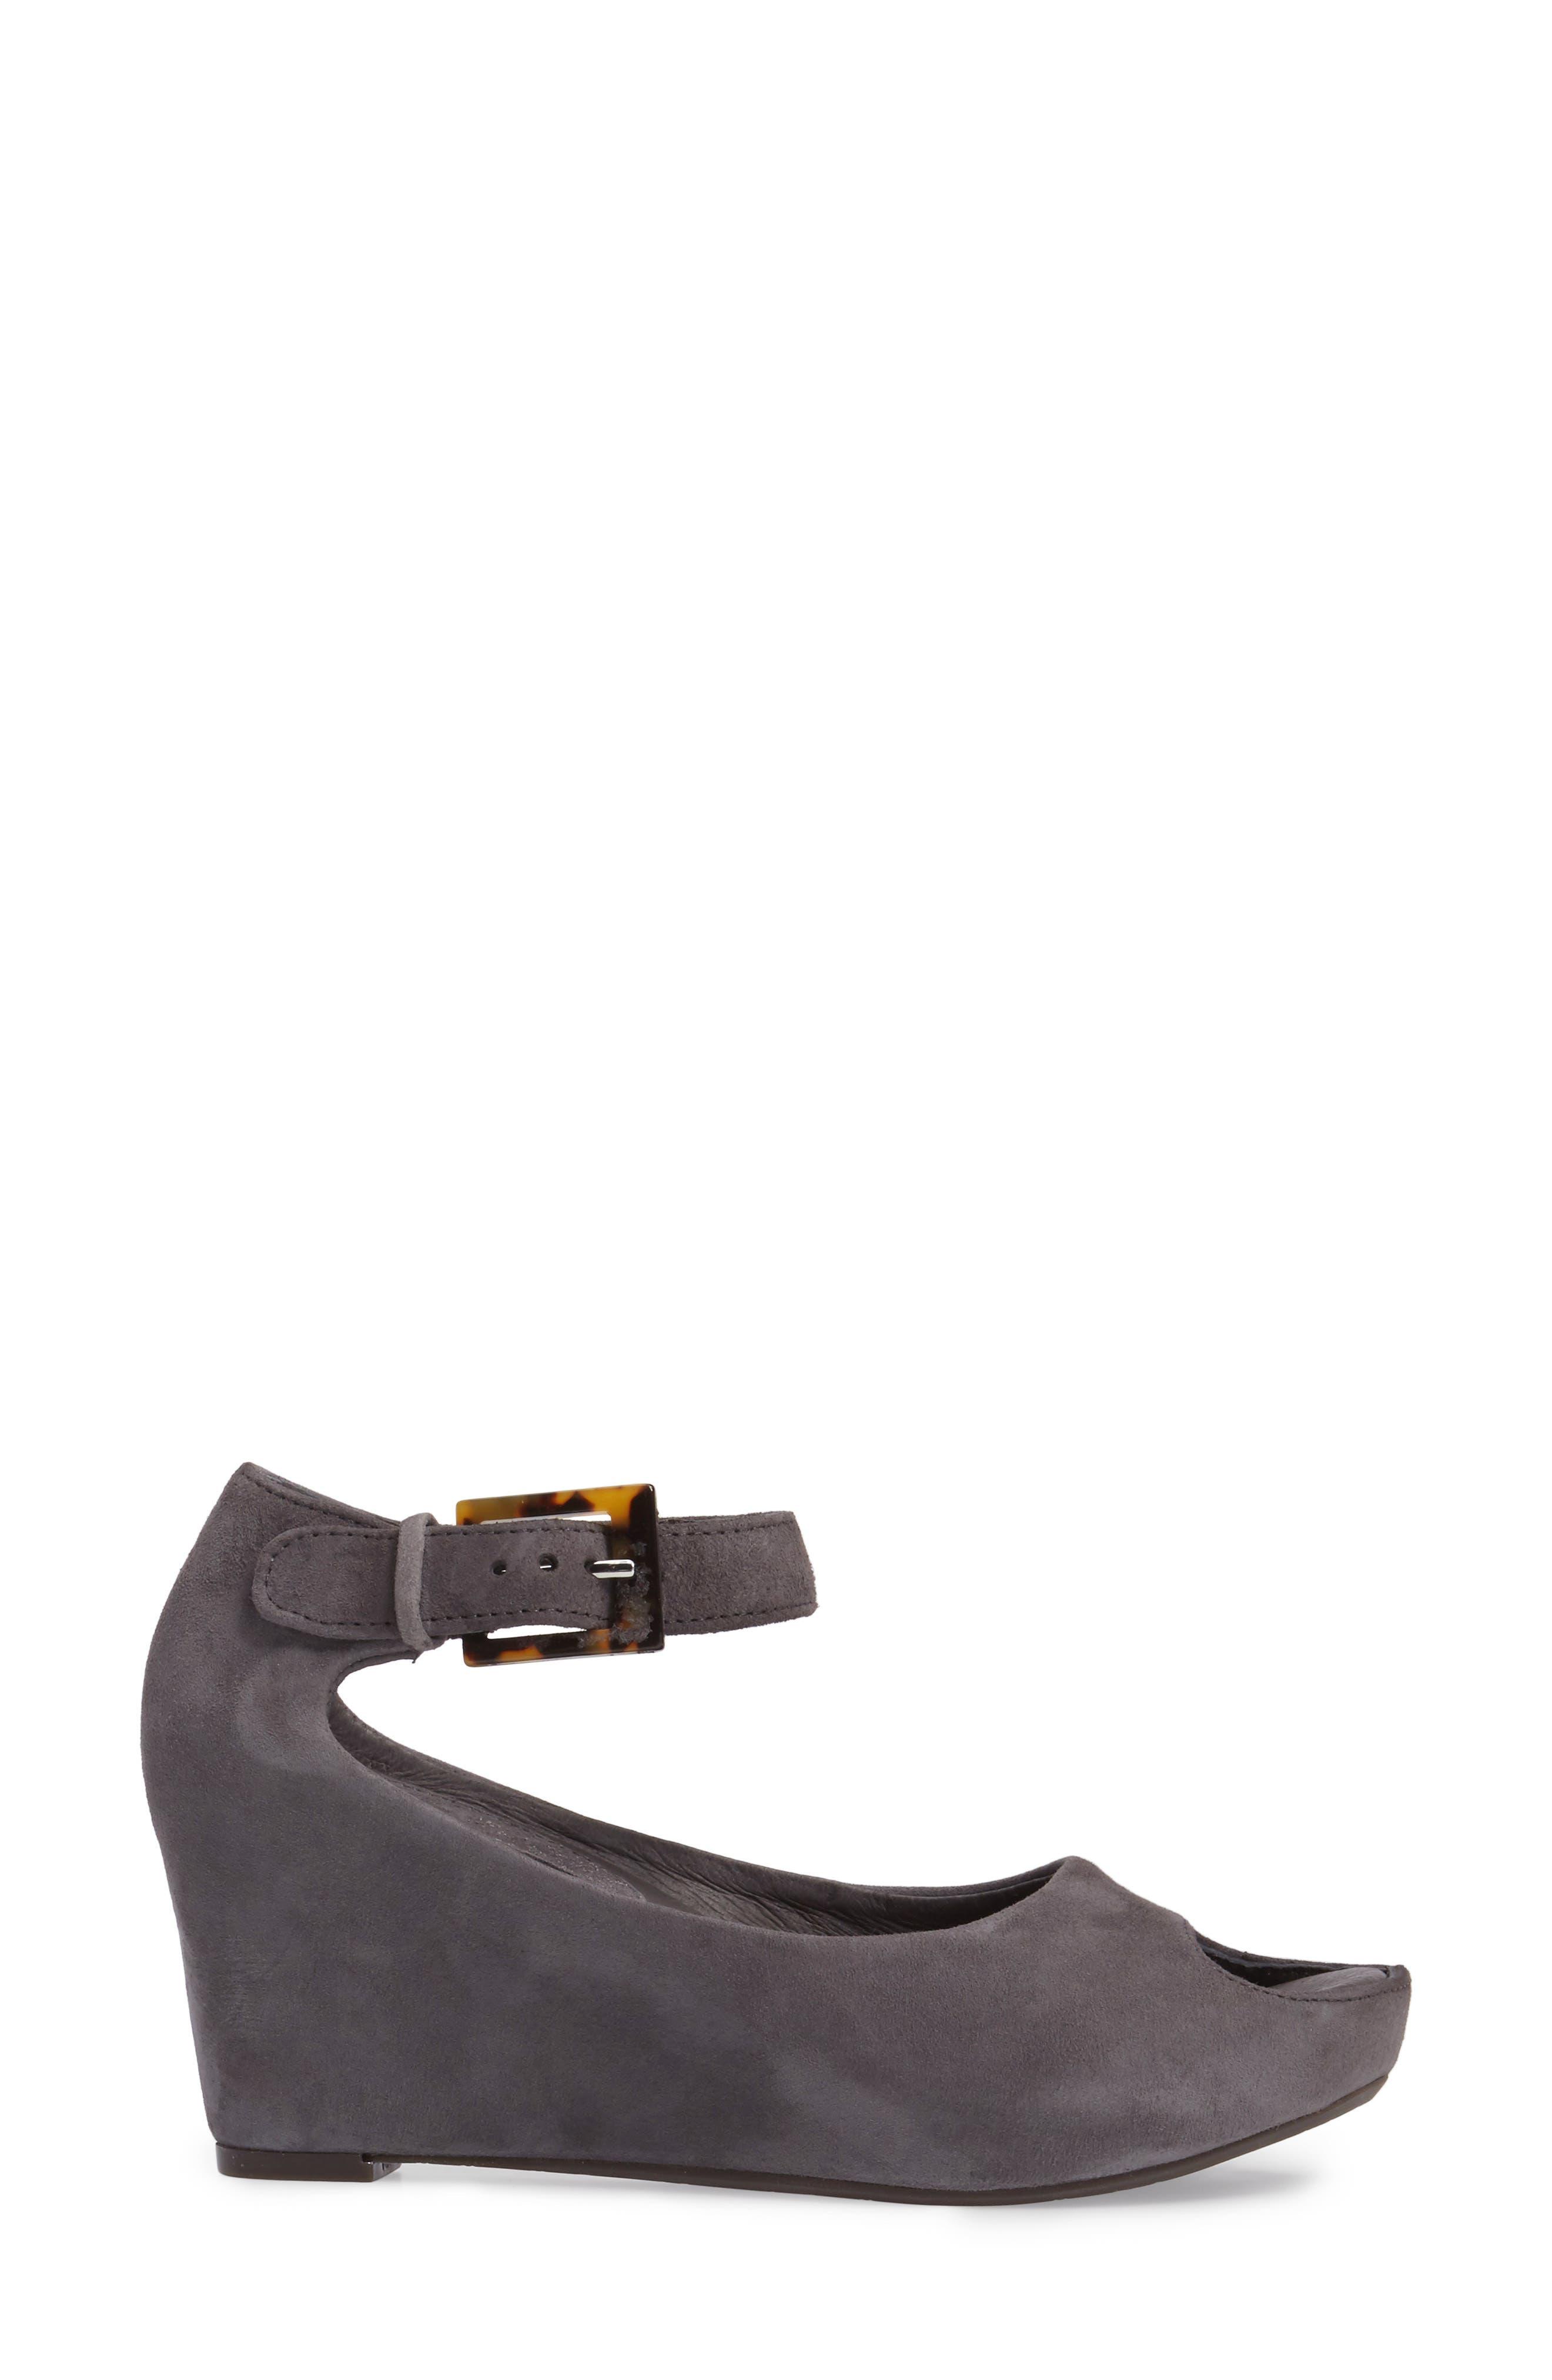 'Tricia' Ankle Strap Sandal,                             Alternate thumbnail 23, color,